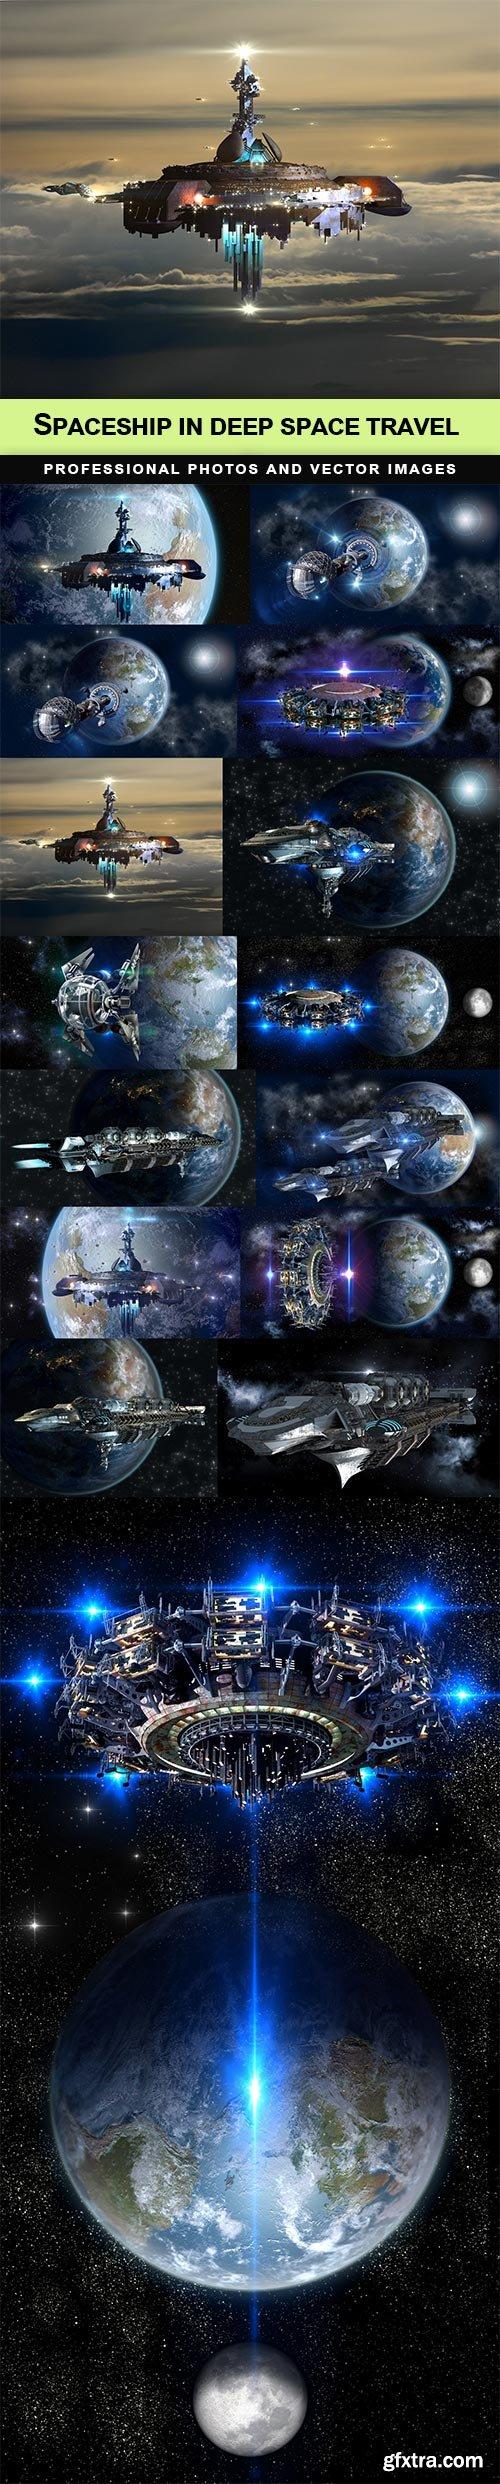 Spaceship in deep space travel - 15 UHQ JPEG